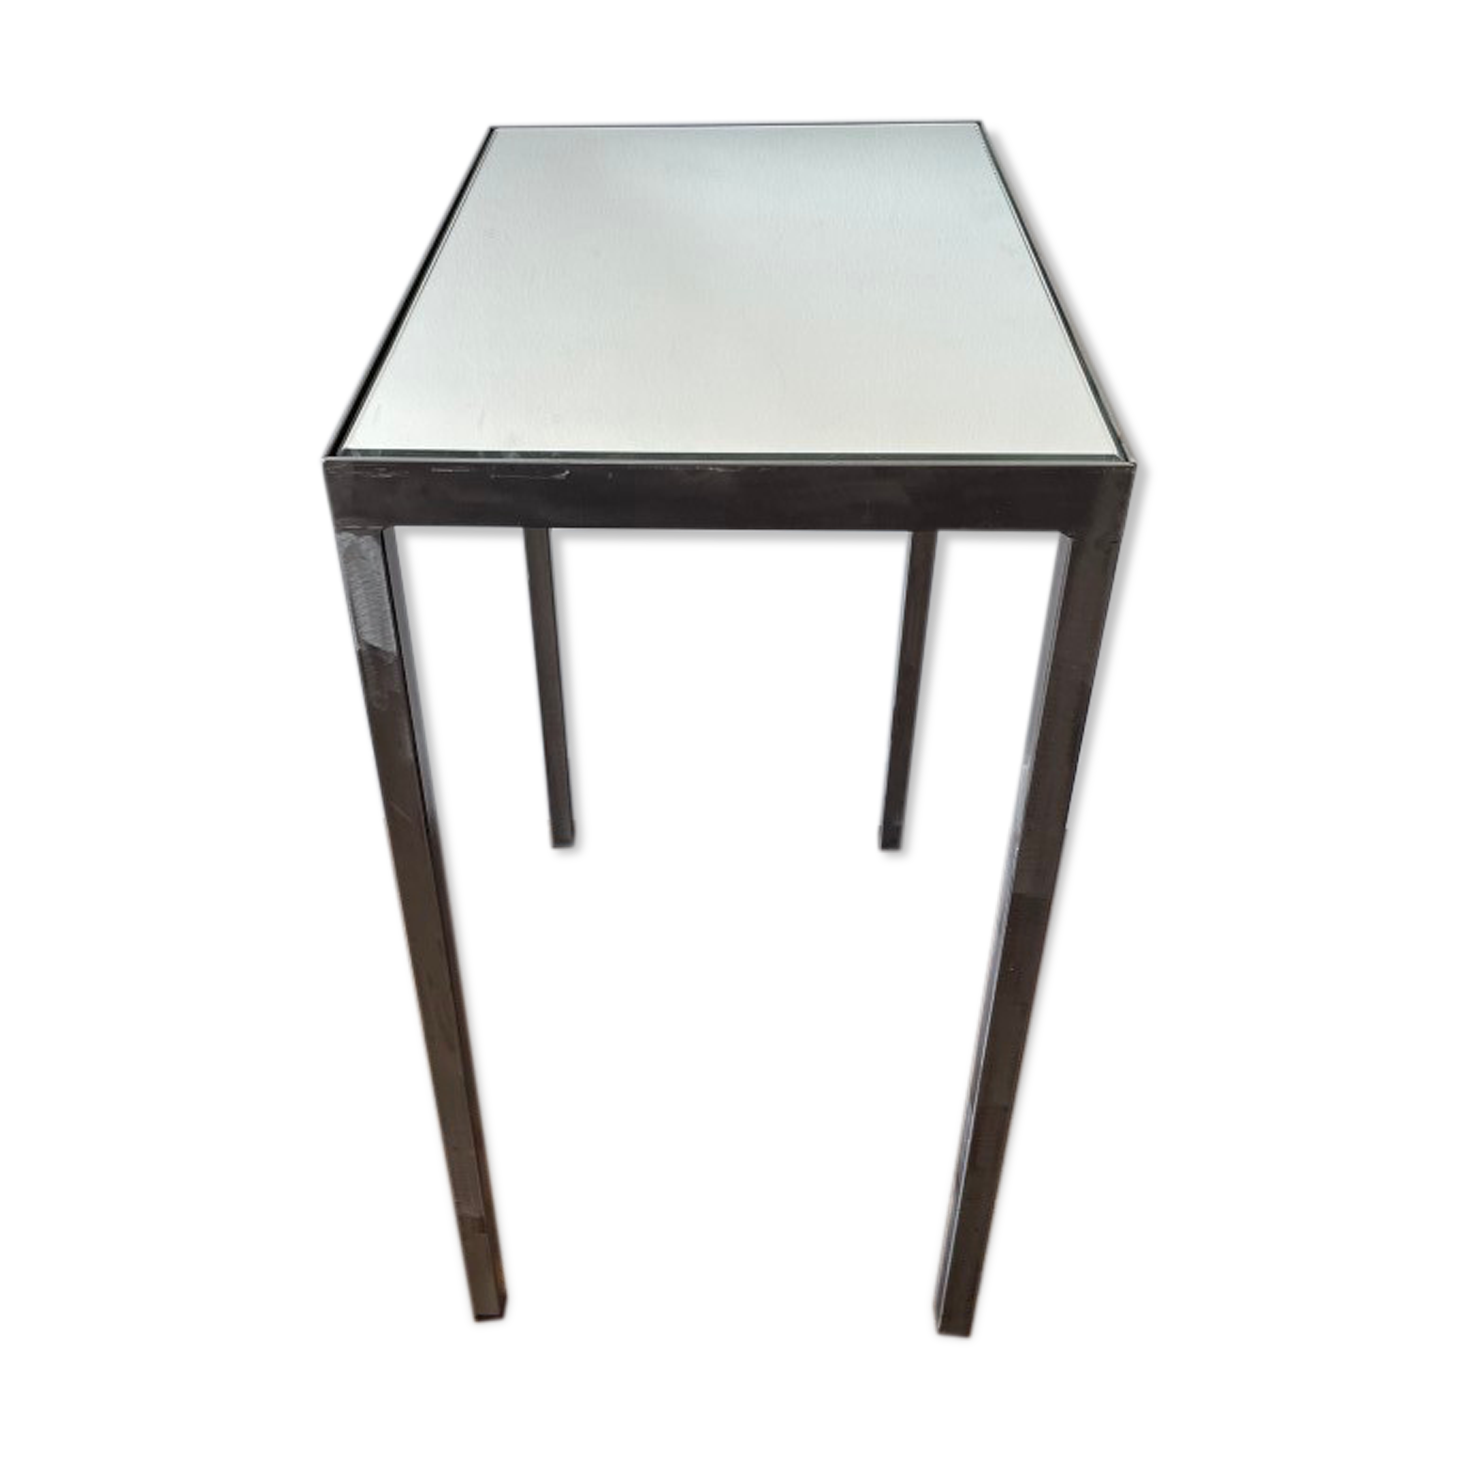 Console ou rallonge table à manger Chantal Peyrat